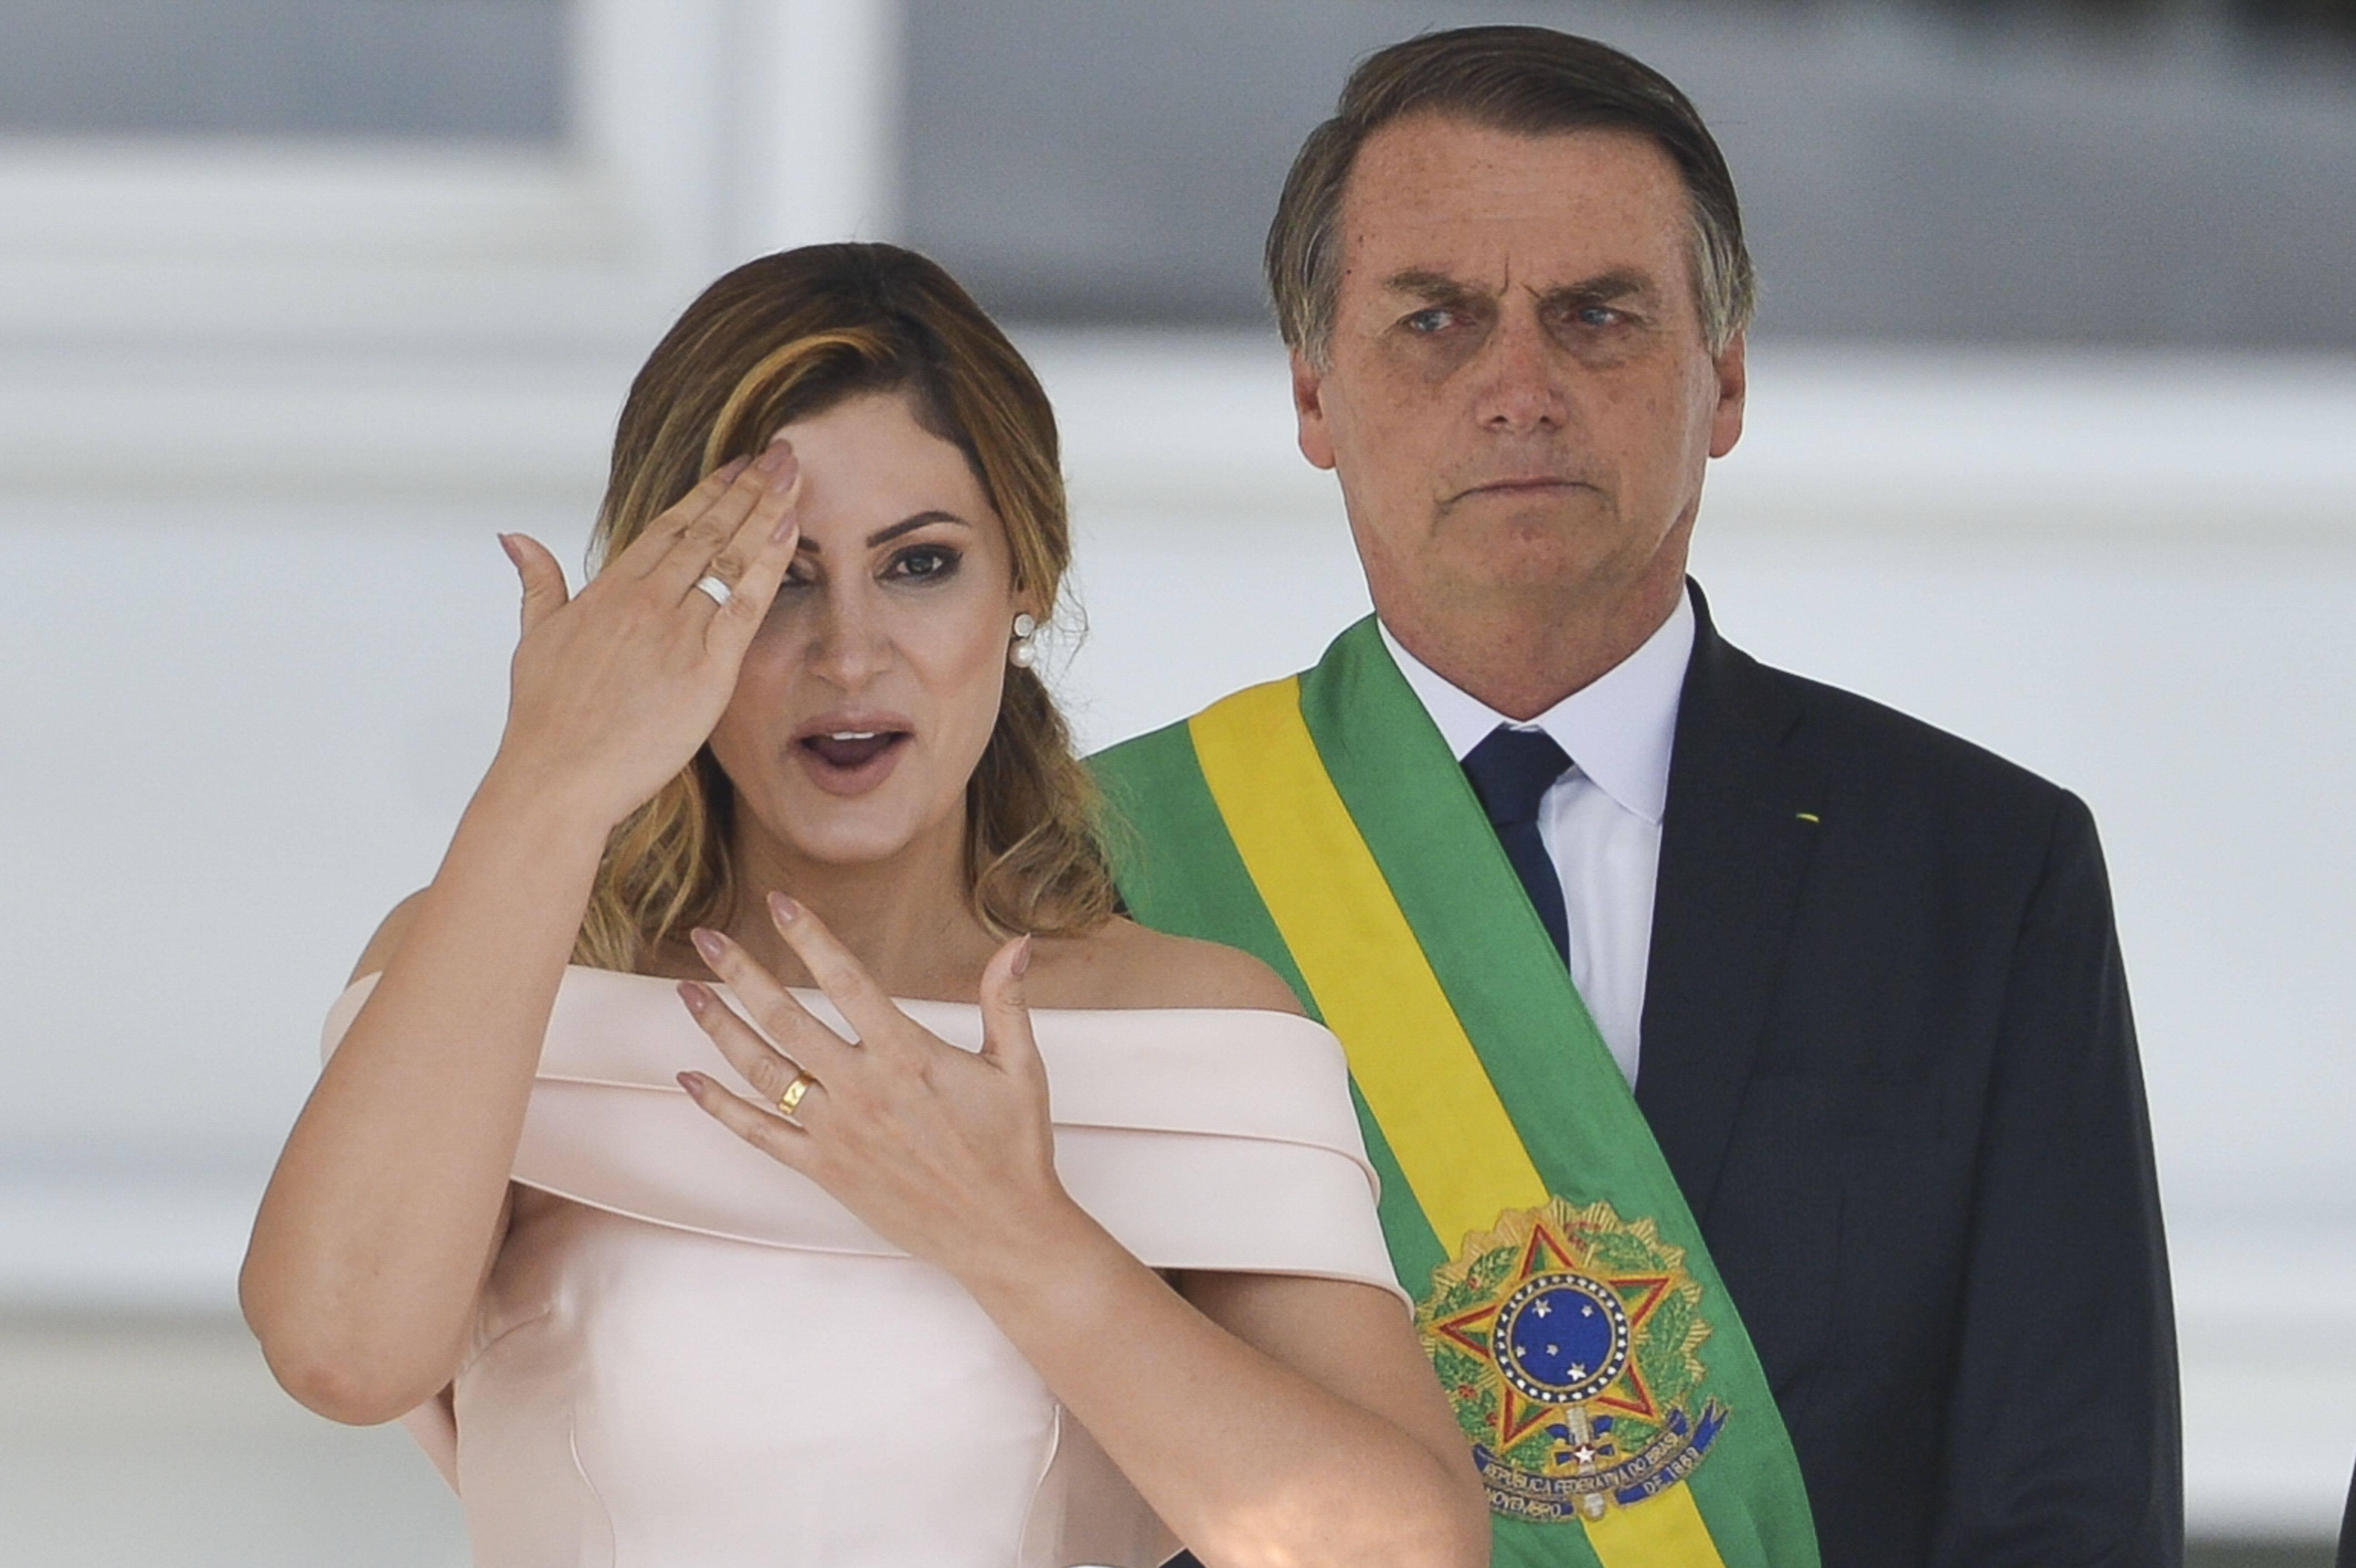 Michelle Bolsonaro durante seu discurso, em libras, no parlatório do Planalto. Foto: Marcelo Camargo/Agência Brasil - 1.1.19